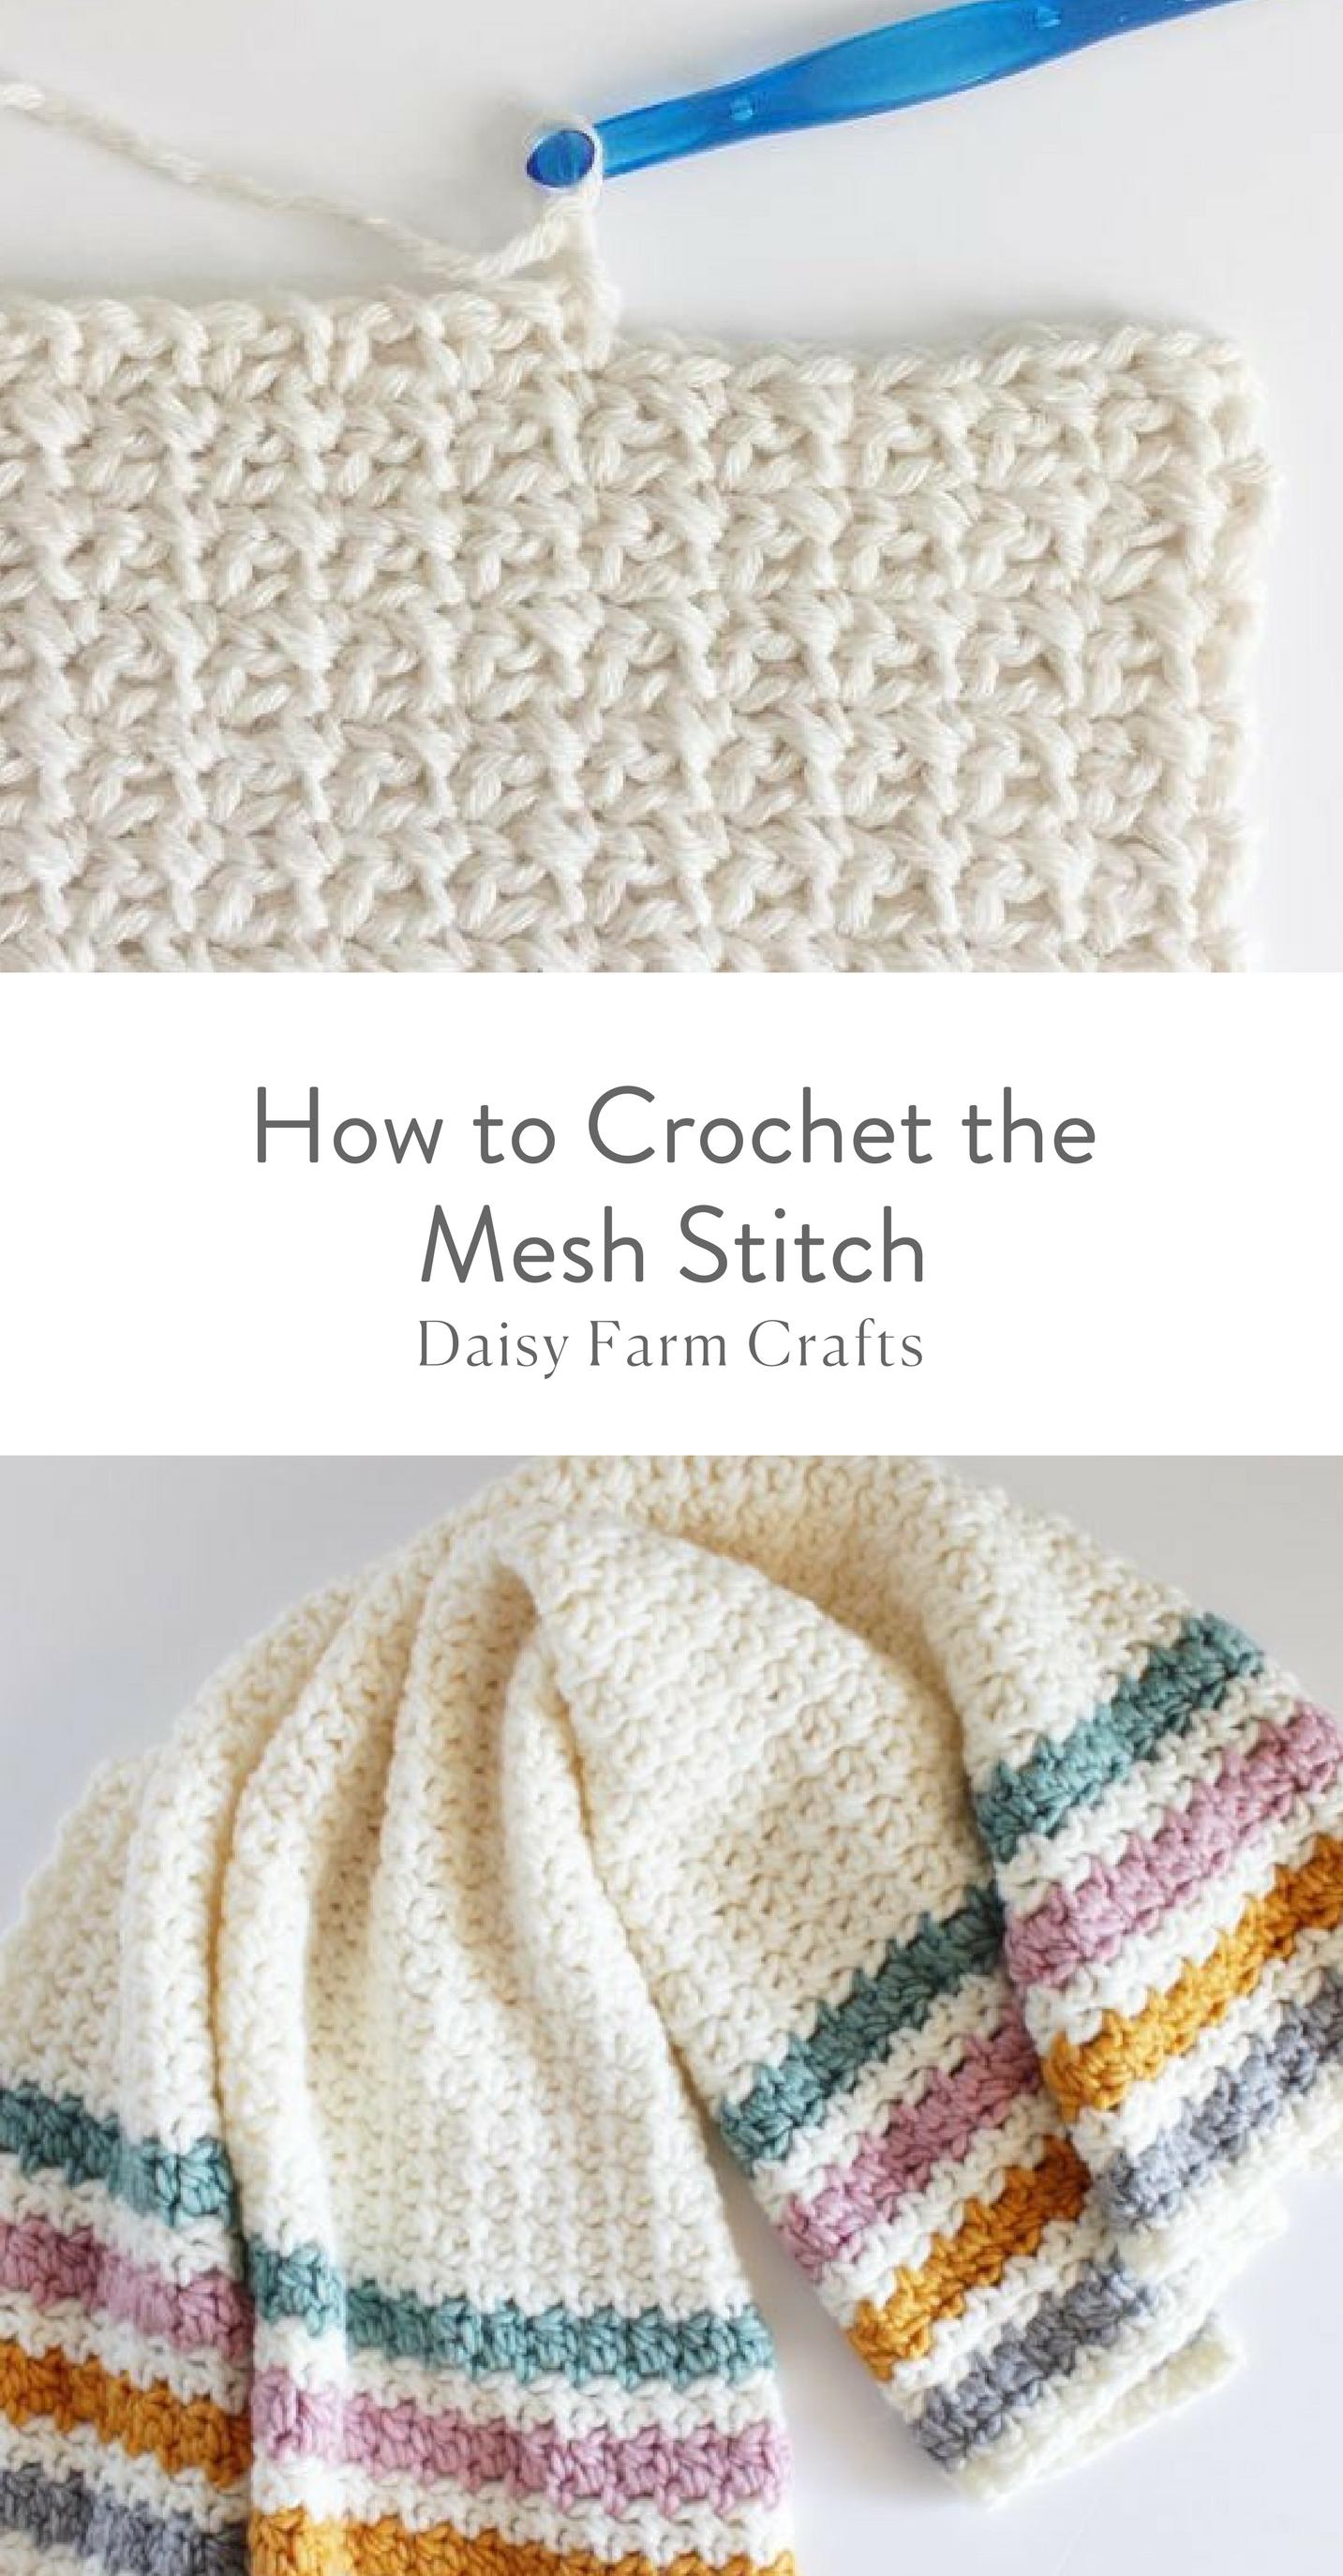 How to Crochet the Mesh Stitch | Daisy Farm Crafts | Pinterest ...